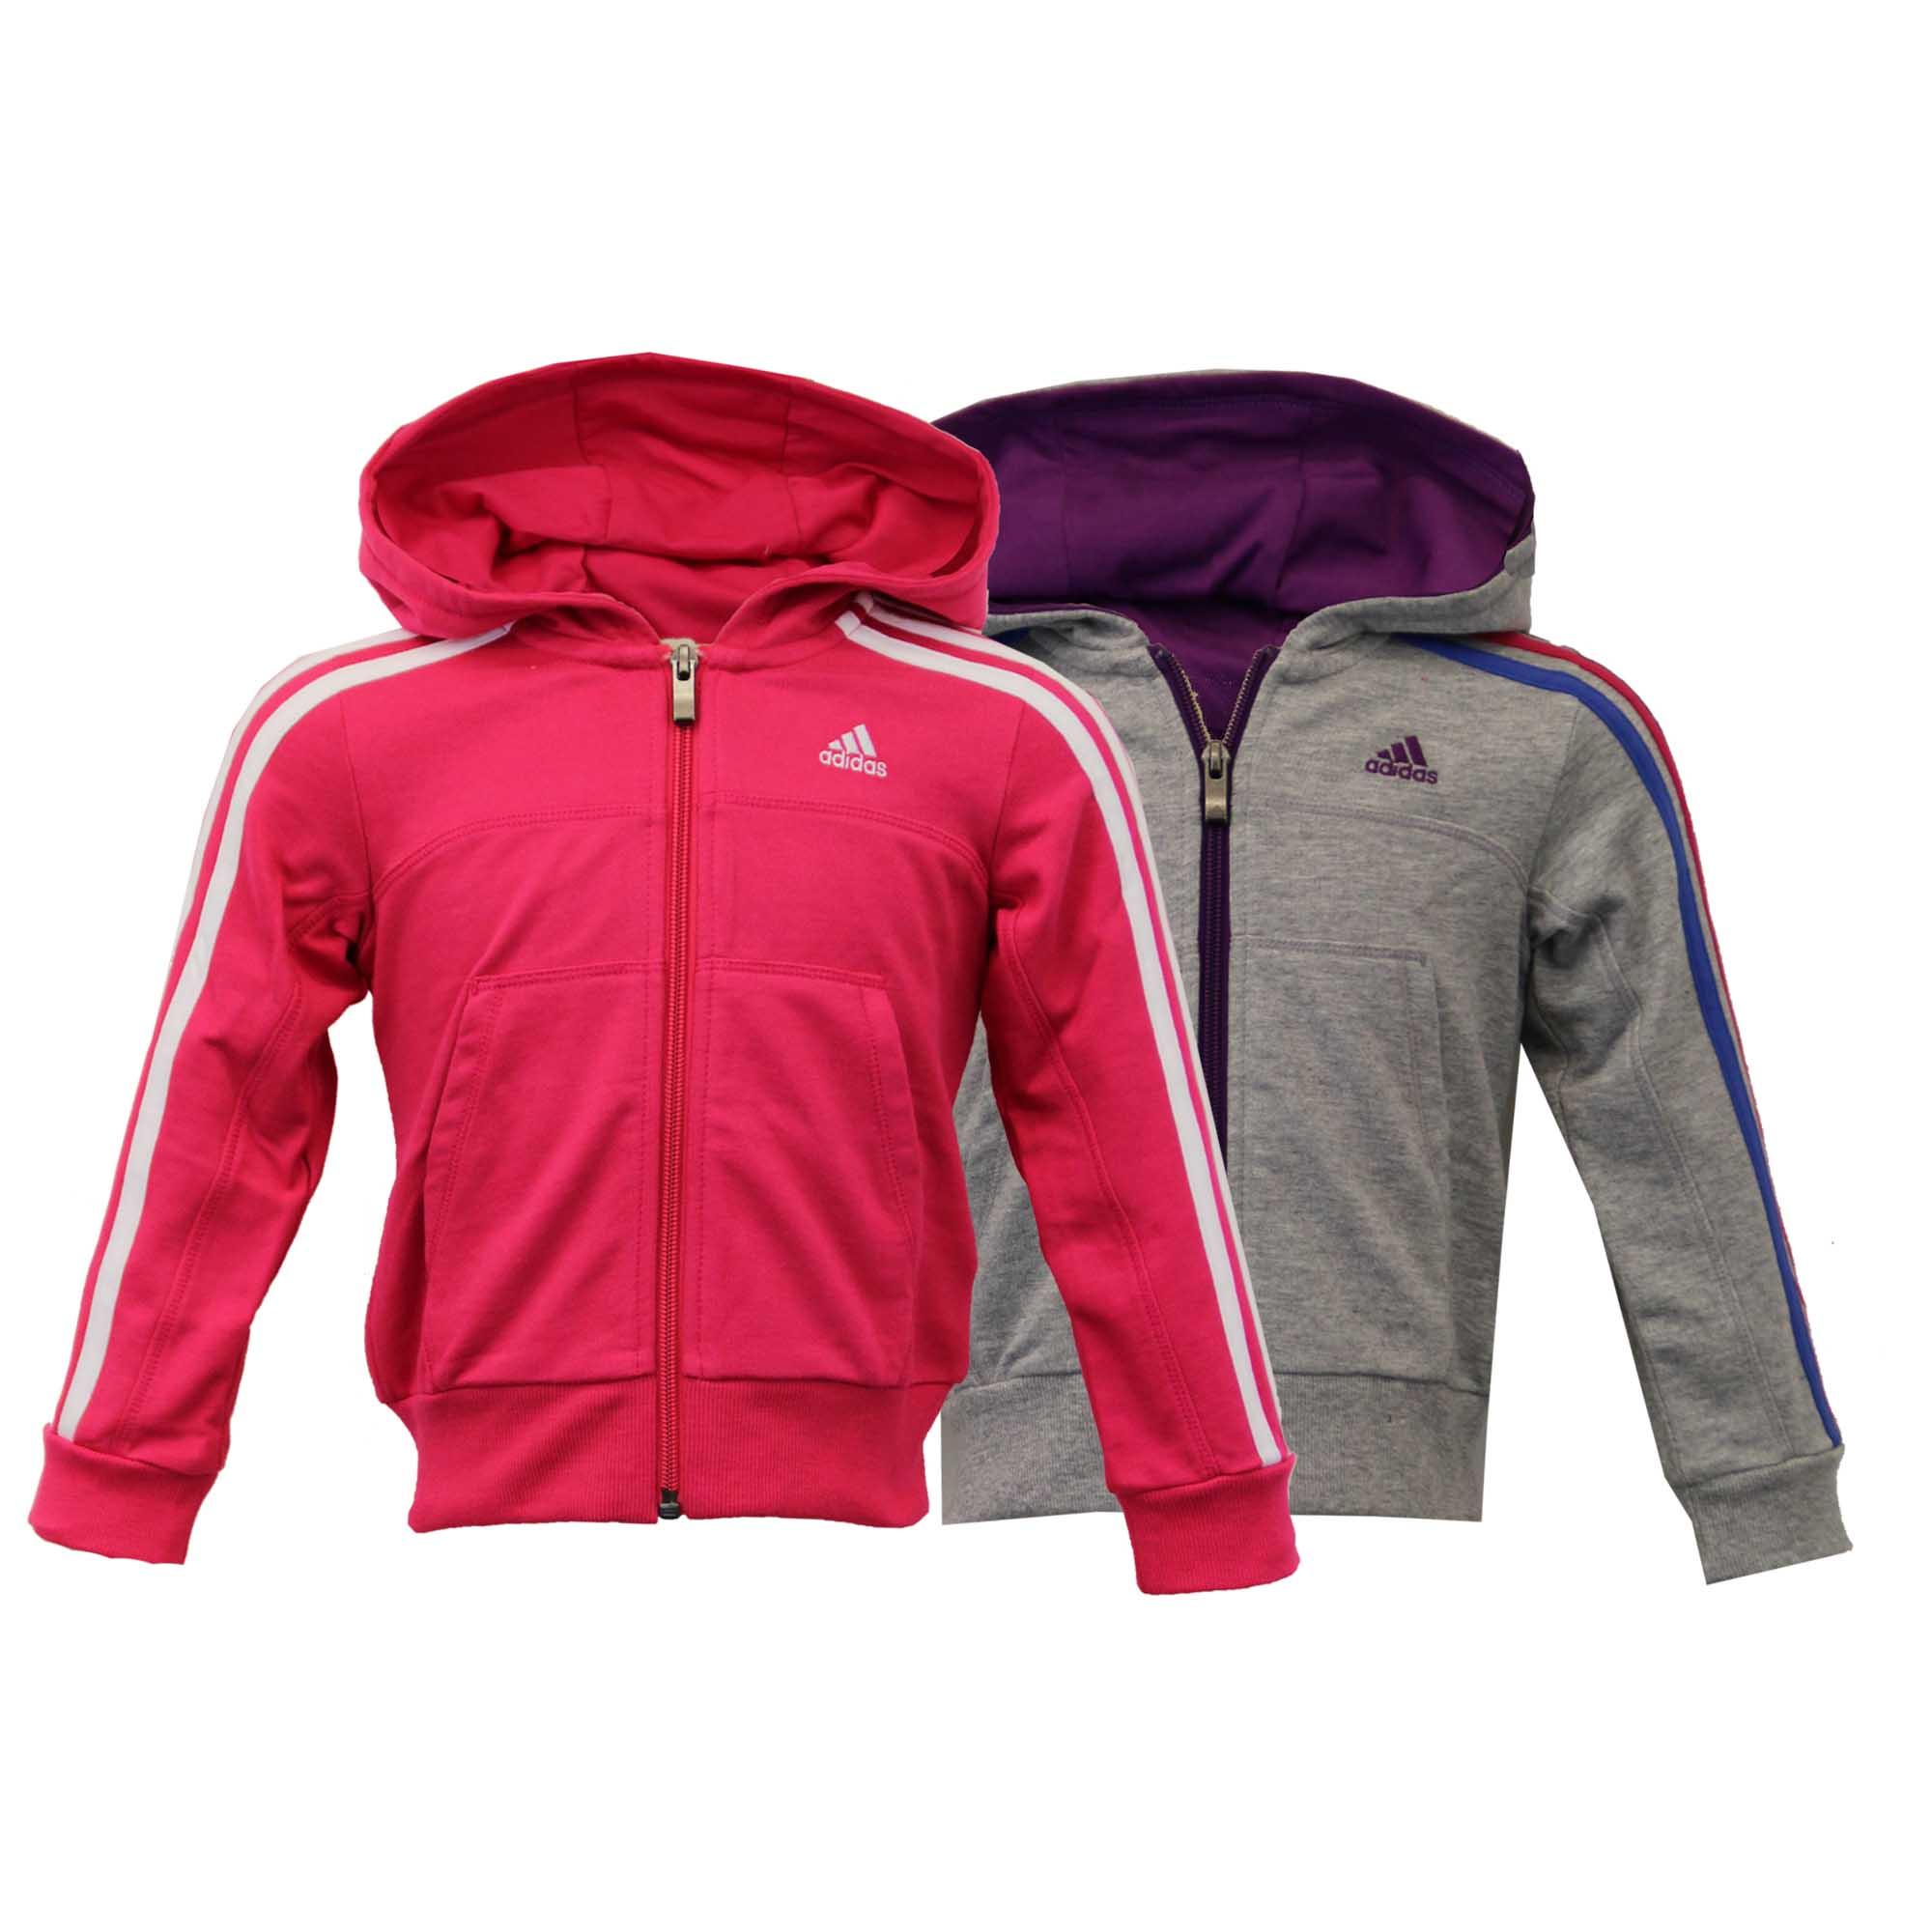 Girls Sweatshirt ADIDAS Kids Hooded Stripes Top Children Casual Zip Loopback New | eBay